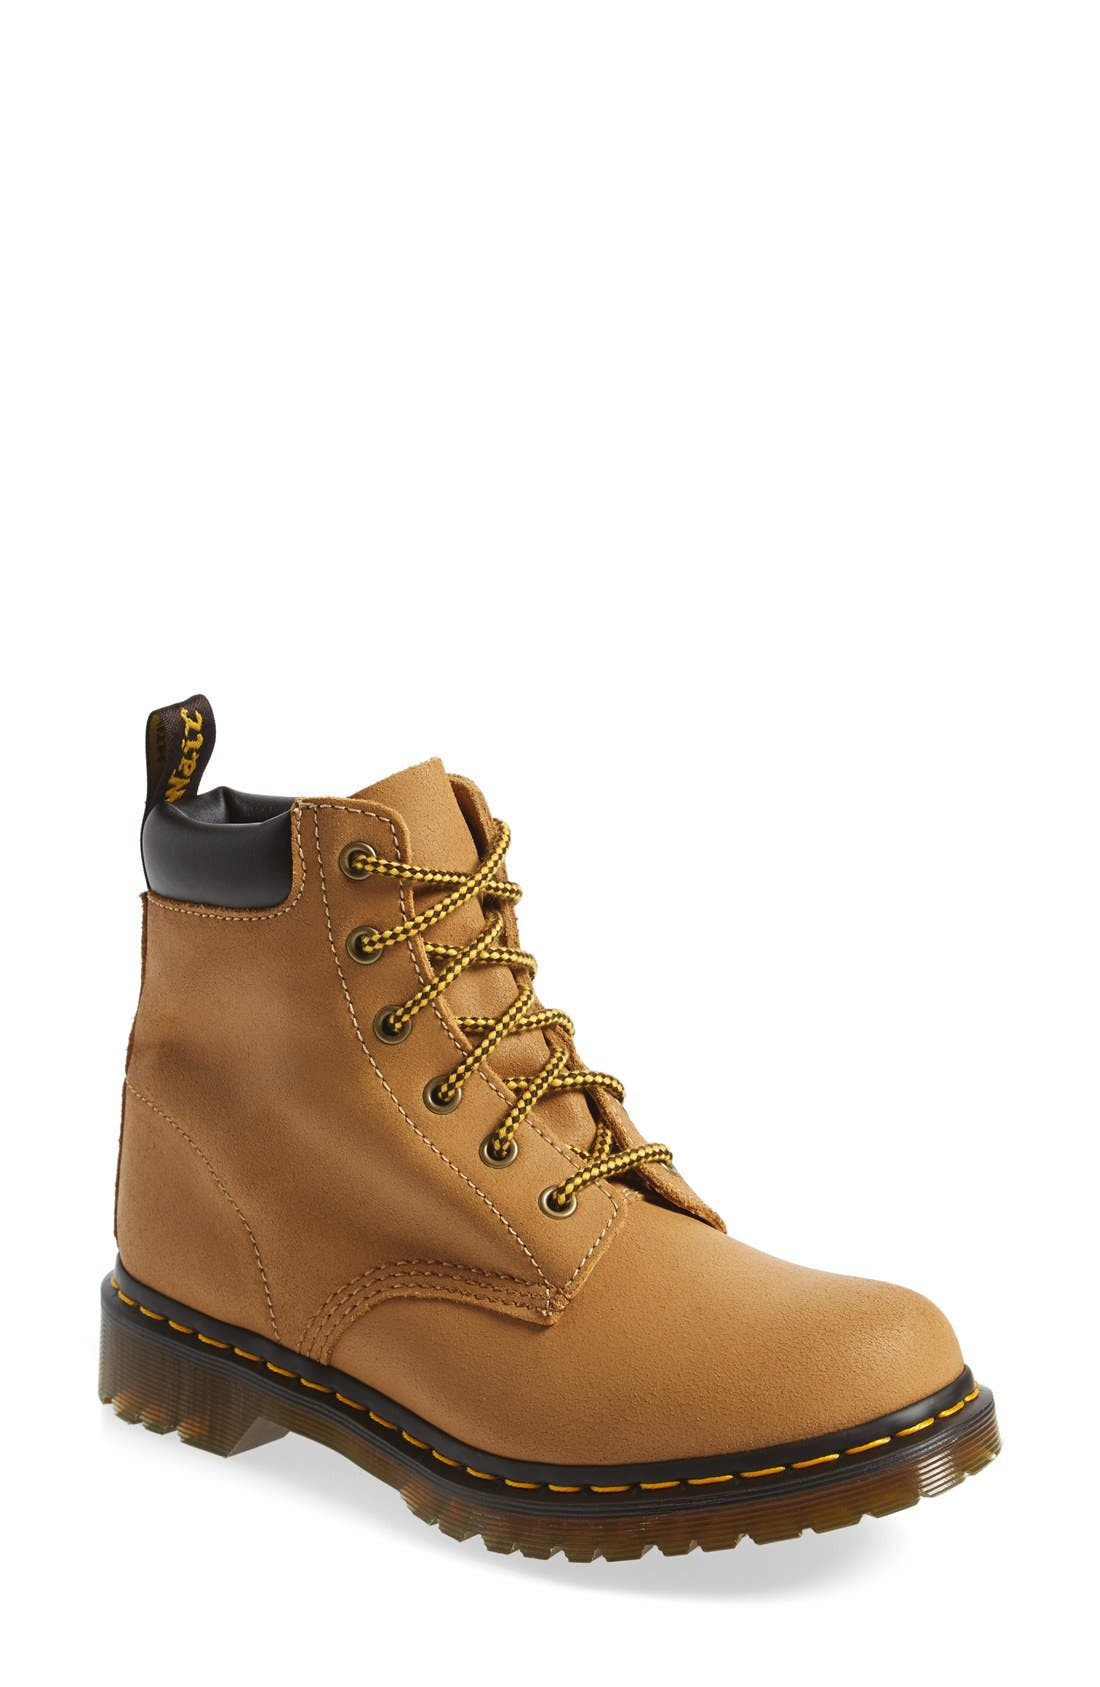 Alternate Image 1 Selected - Dr. Martens '939' Boot (Women)